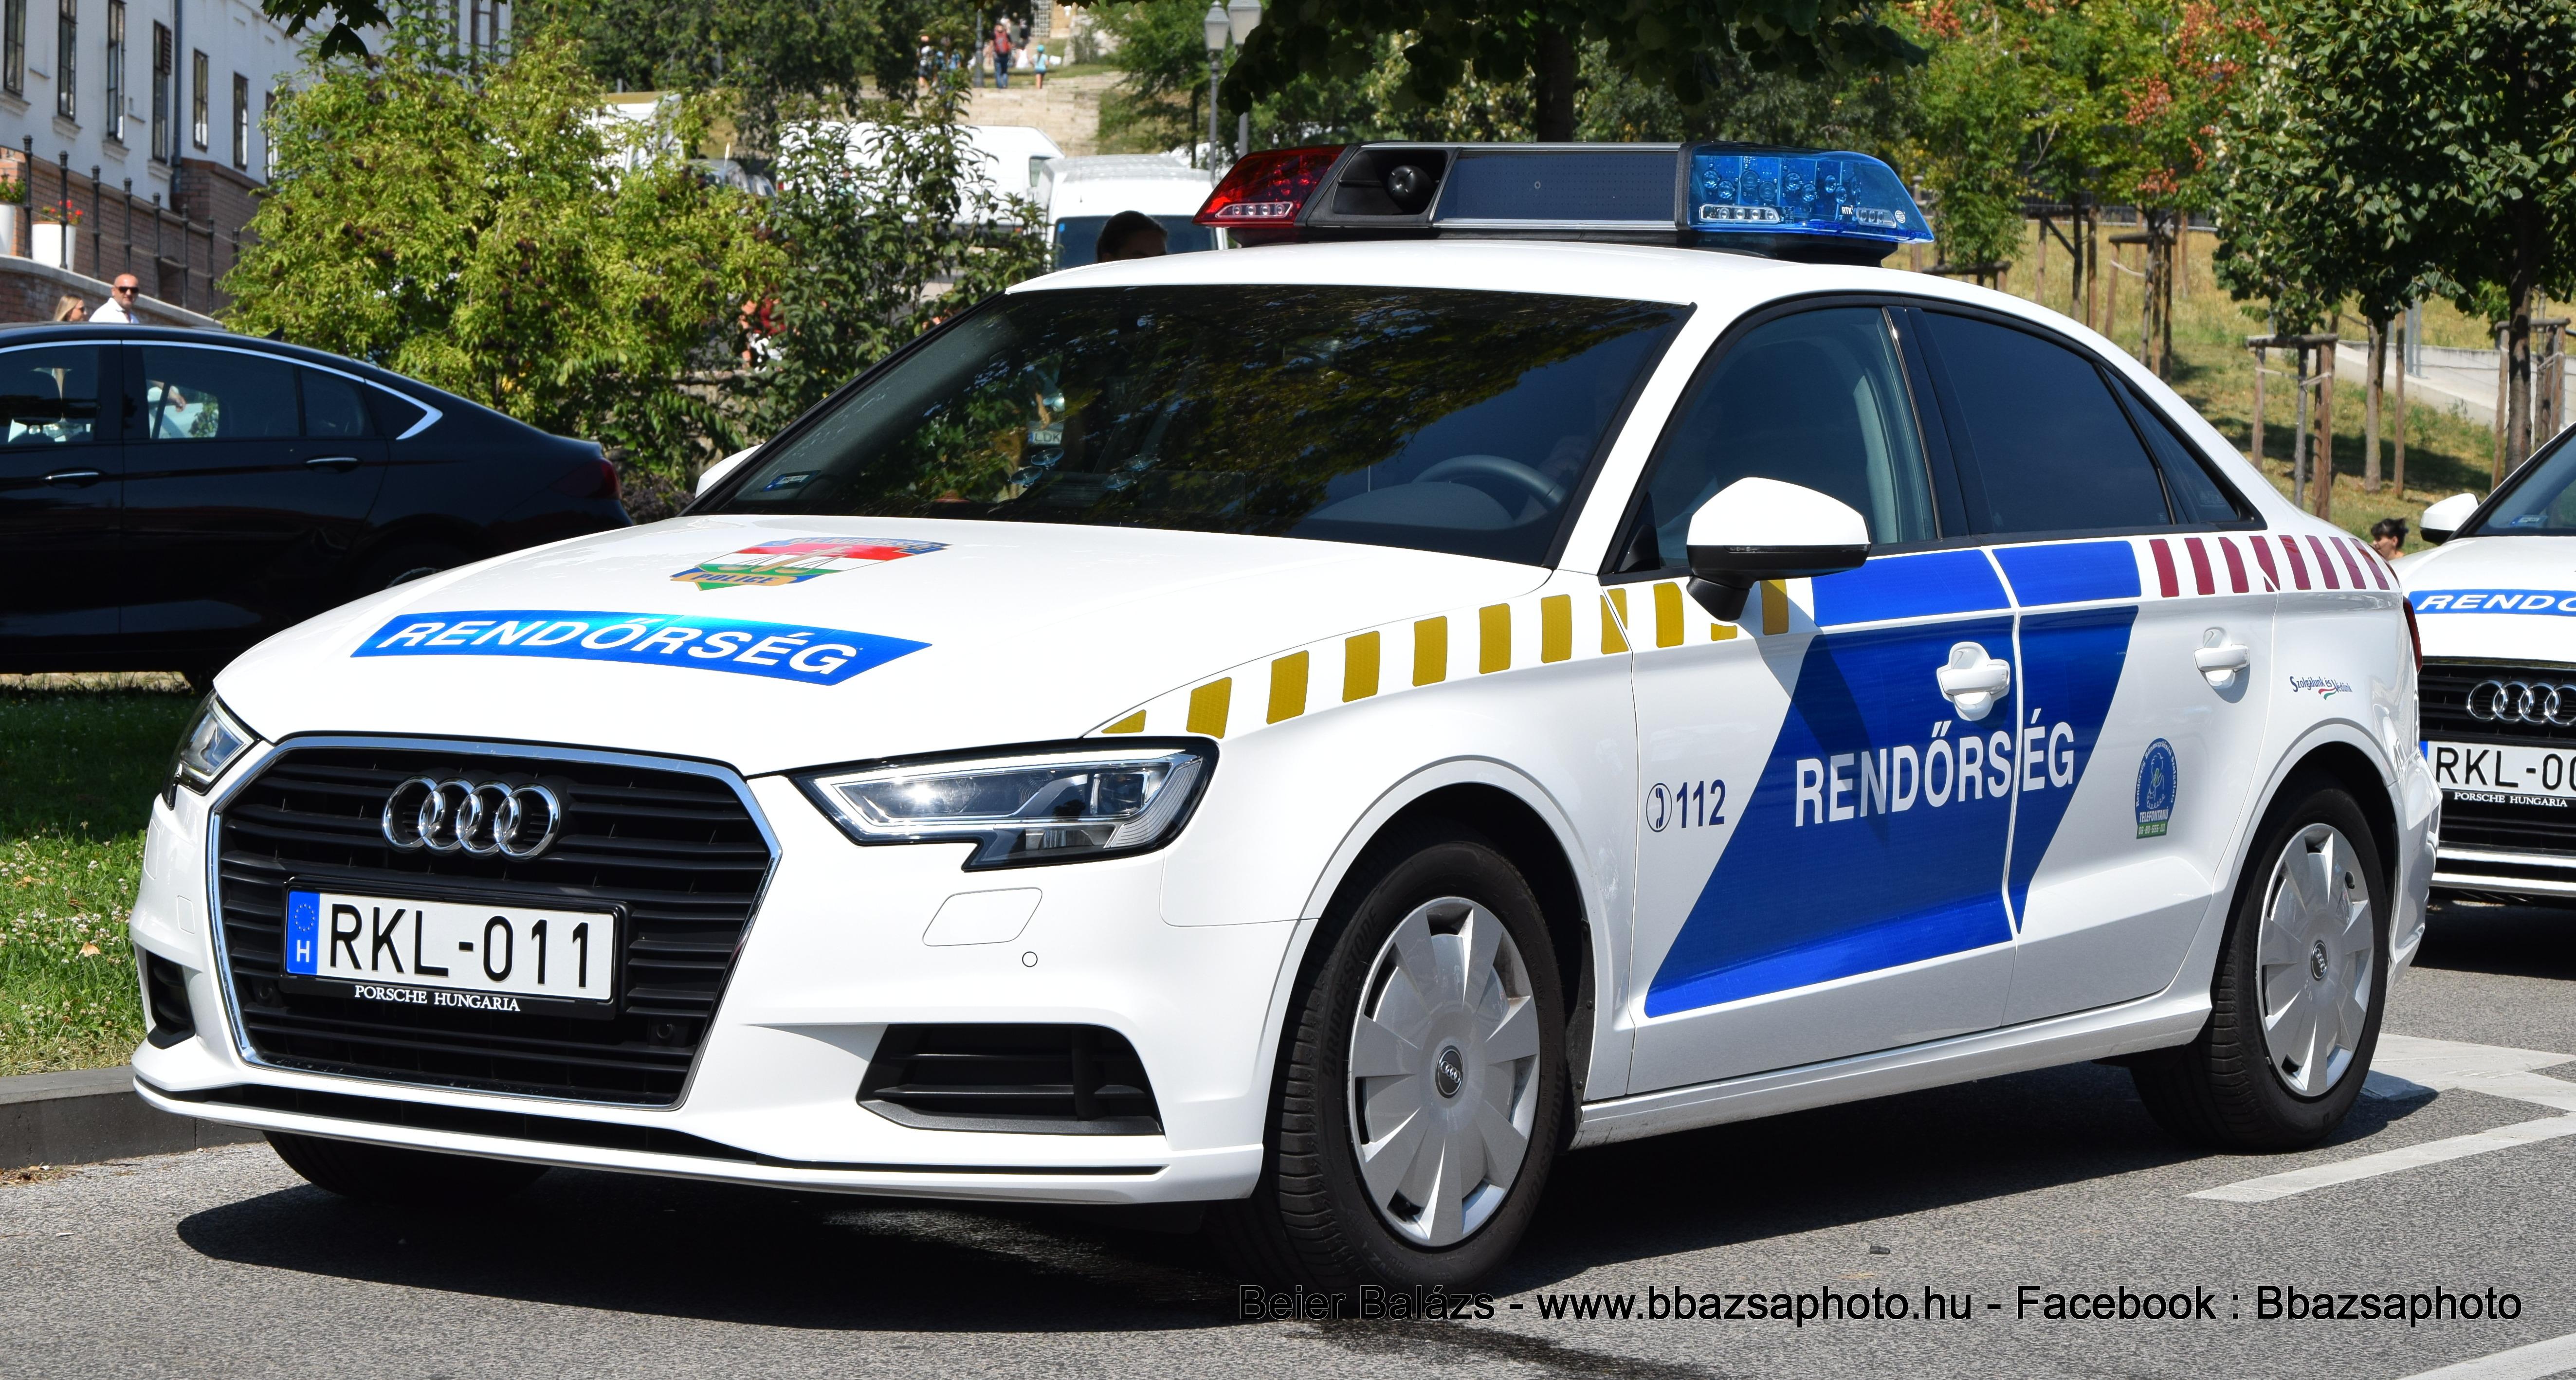 Audi A3 RKL széria